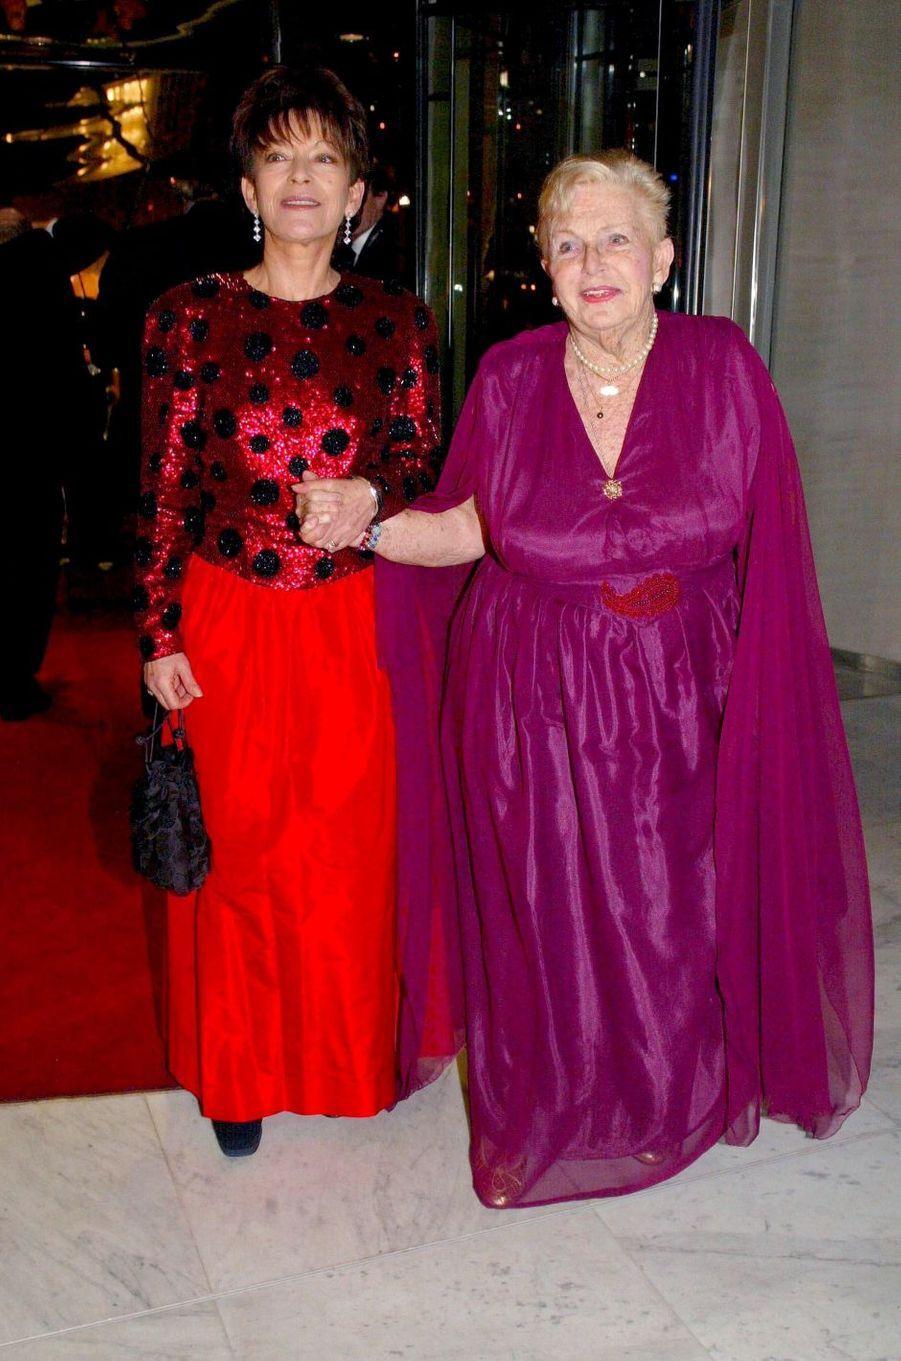 Elizabeth-Ann de Massy avec sa mère la princesse Antoinette de Monaco, le 14 mars 2002